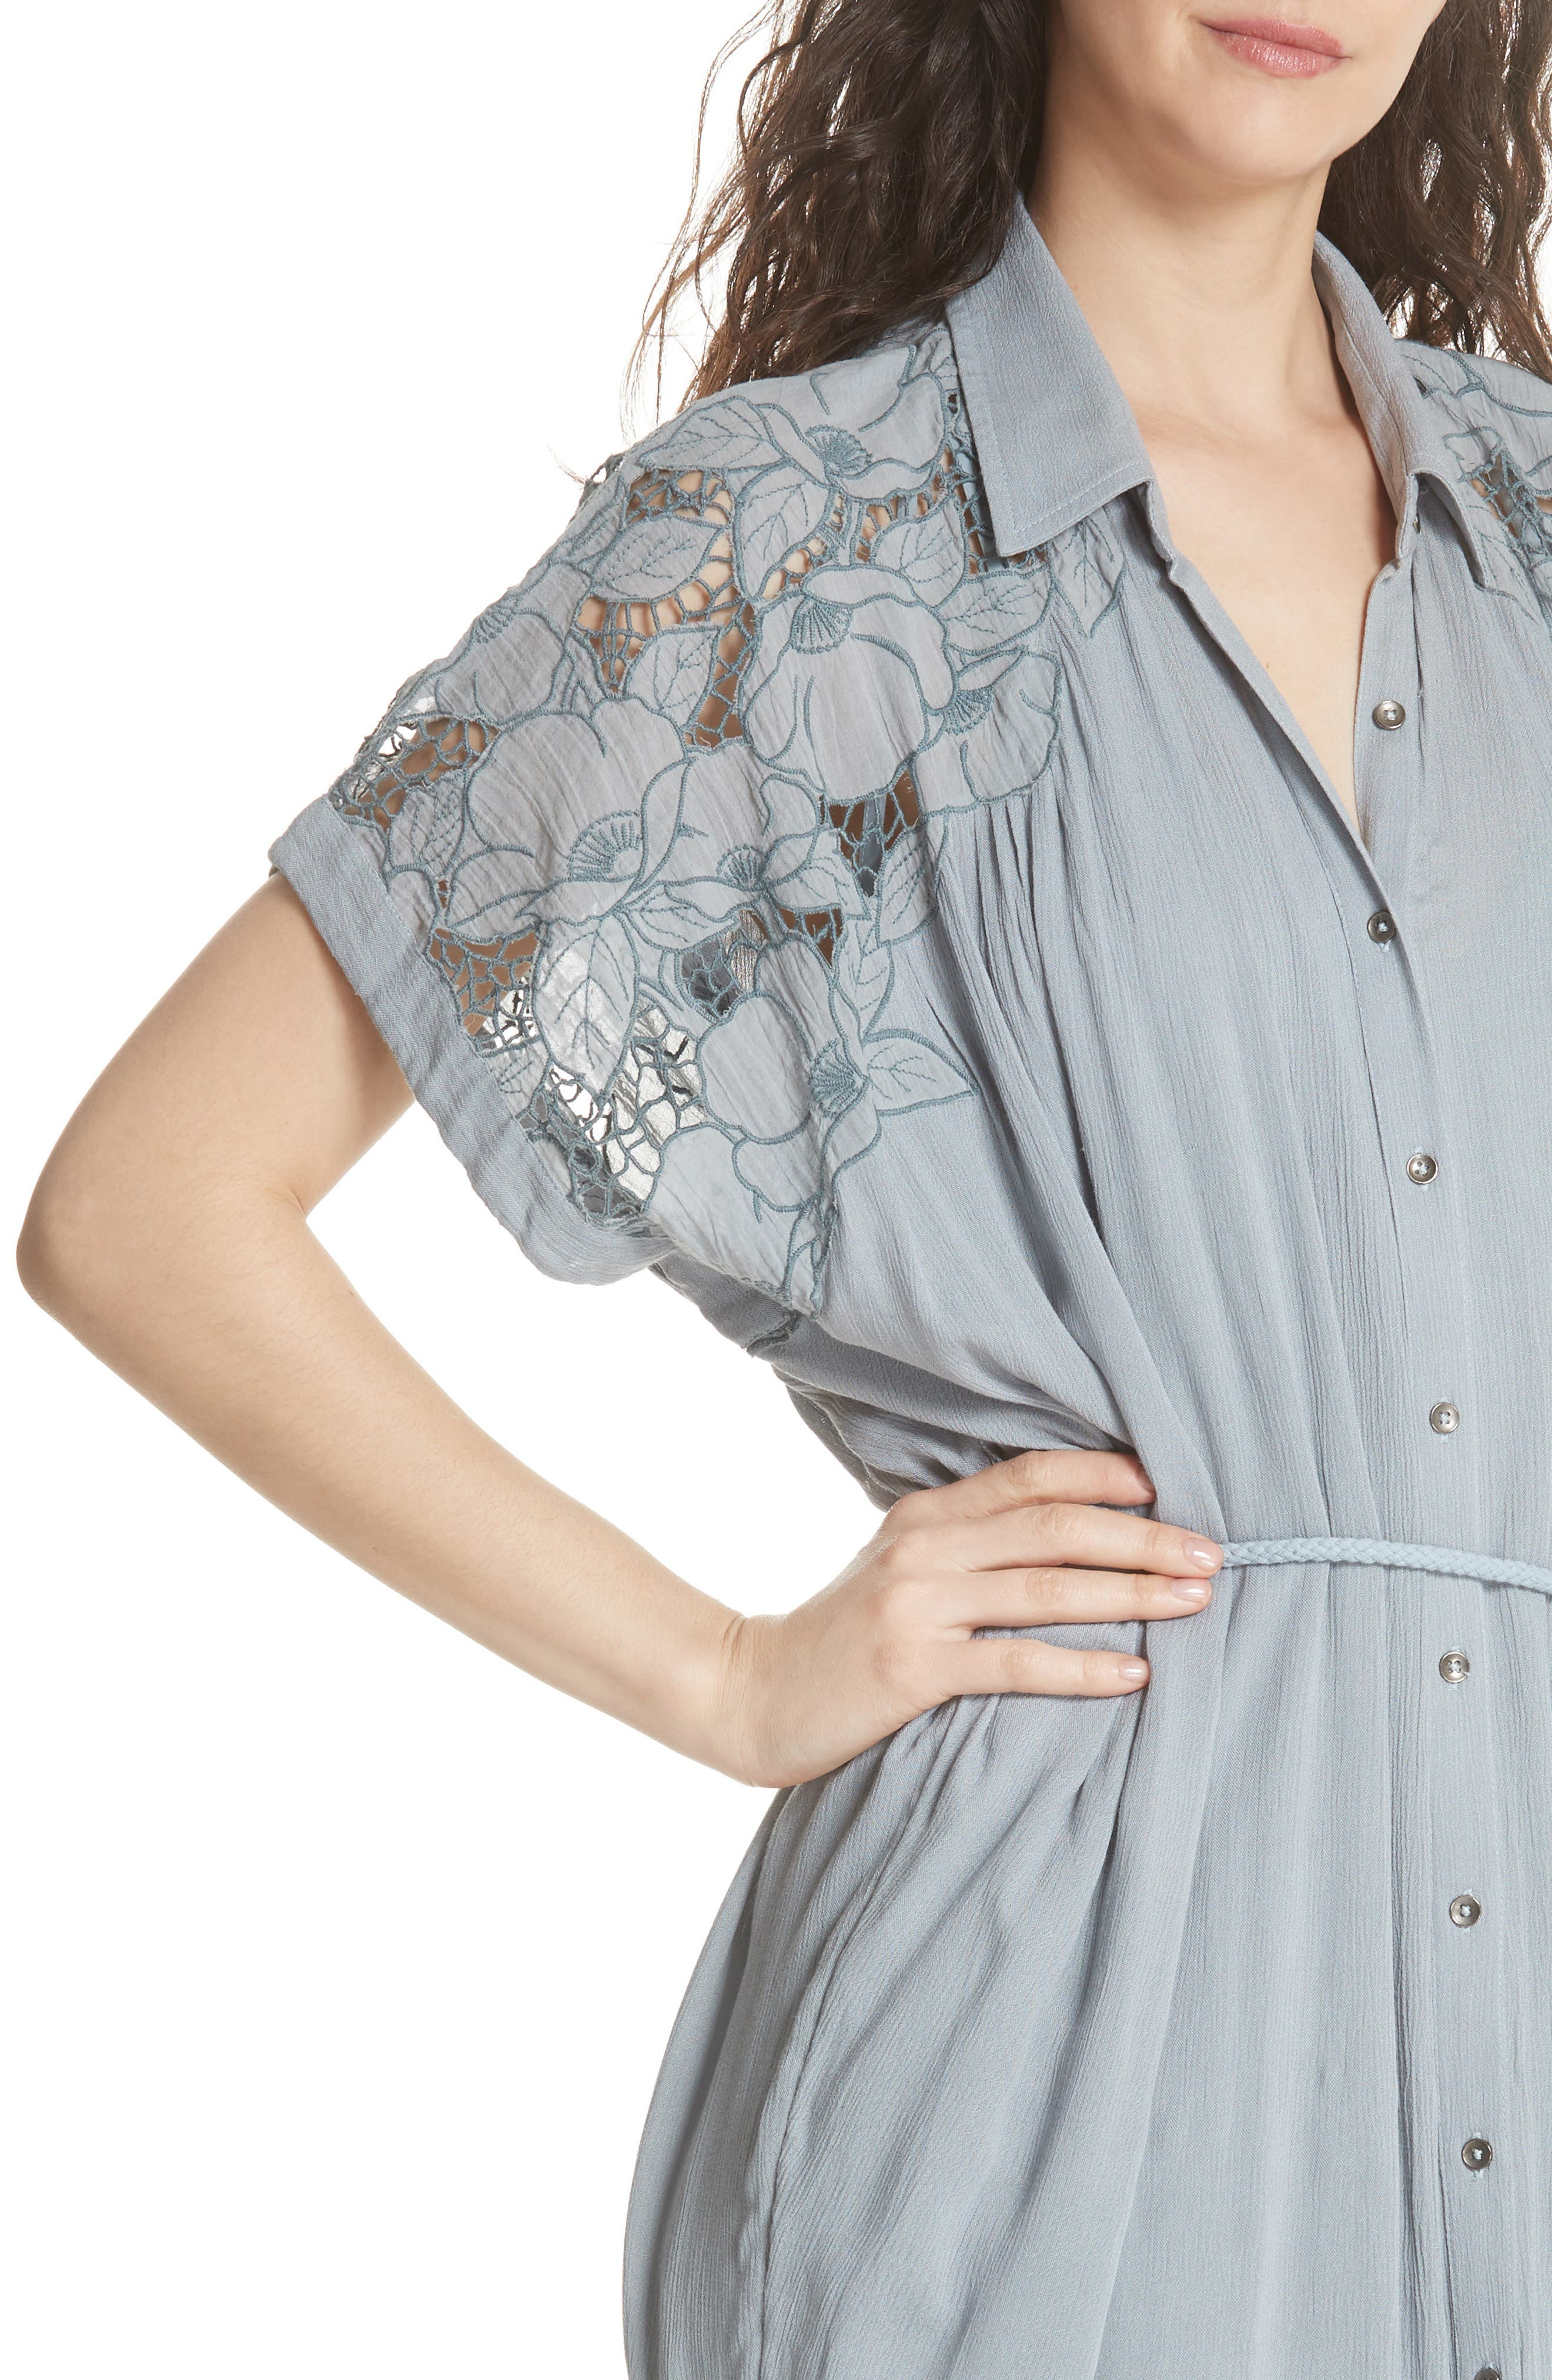 Cut It Out Midi Shirtdress,                             Alternate thumbnail 4, color,                             Blue